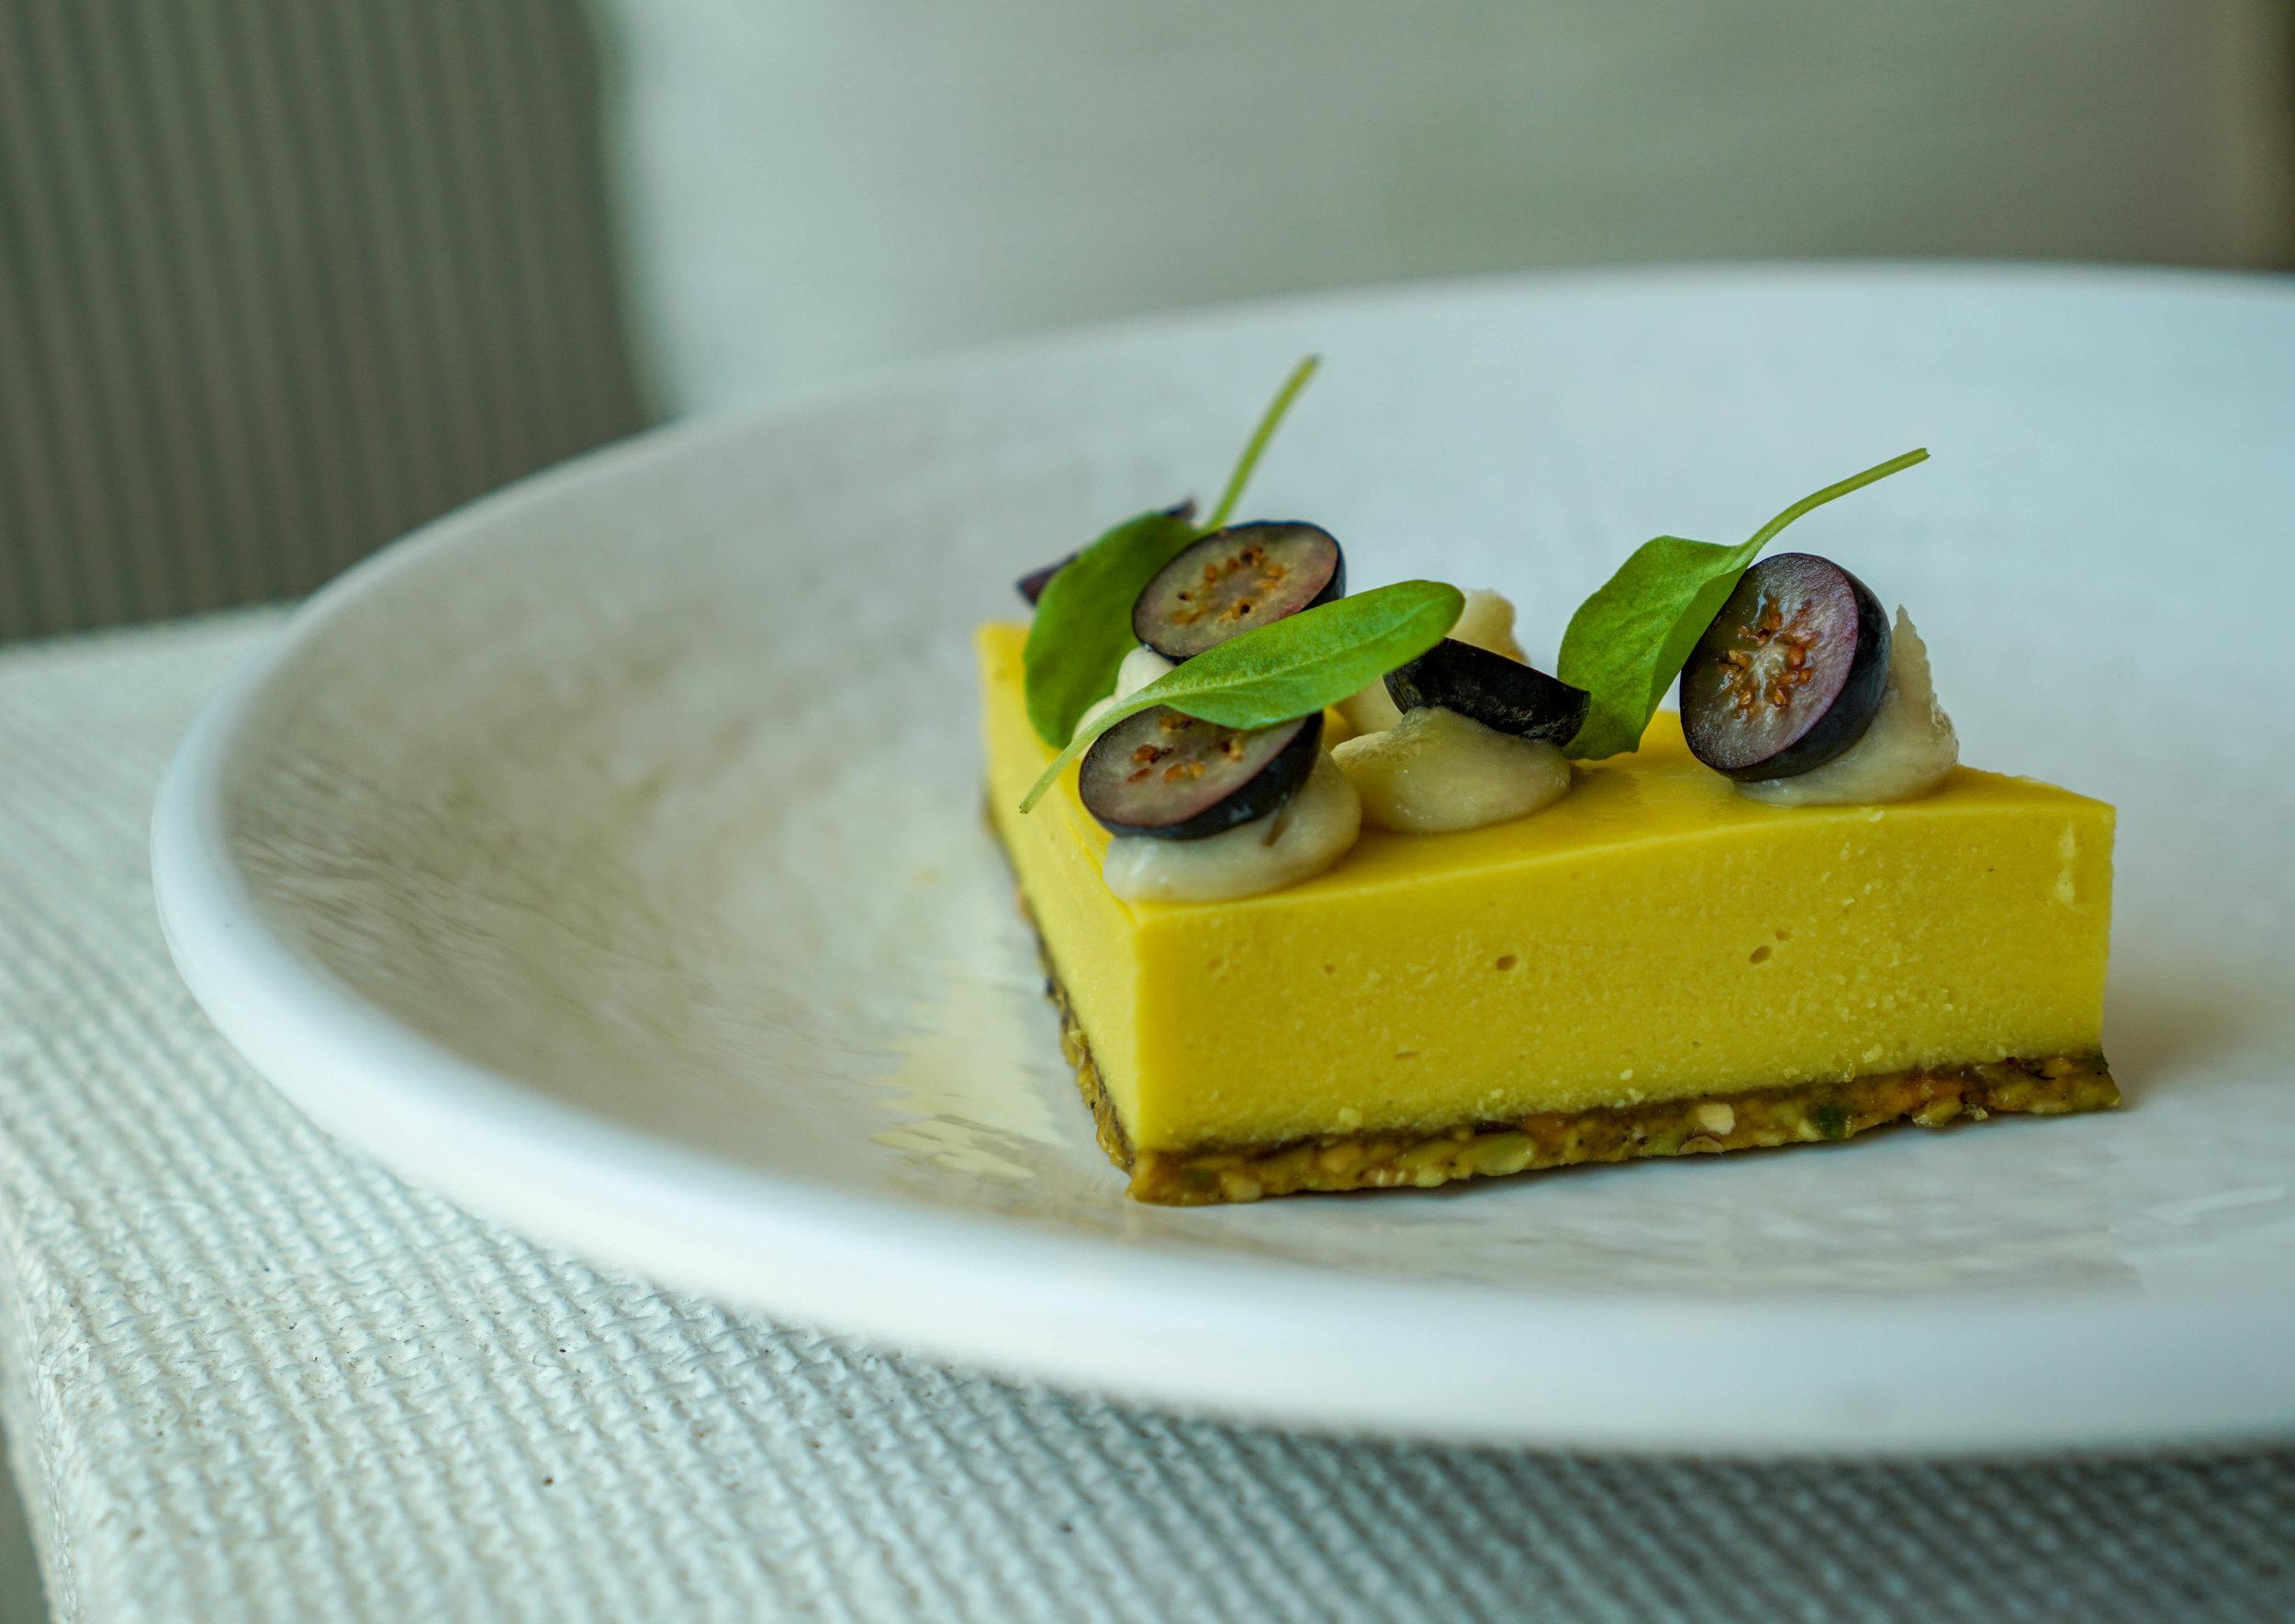 Plnthouse 1 Hotel Mango Cheescake dessert